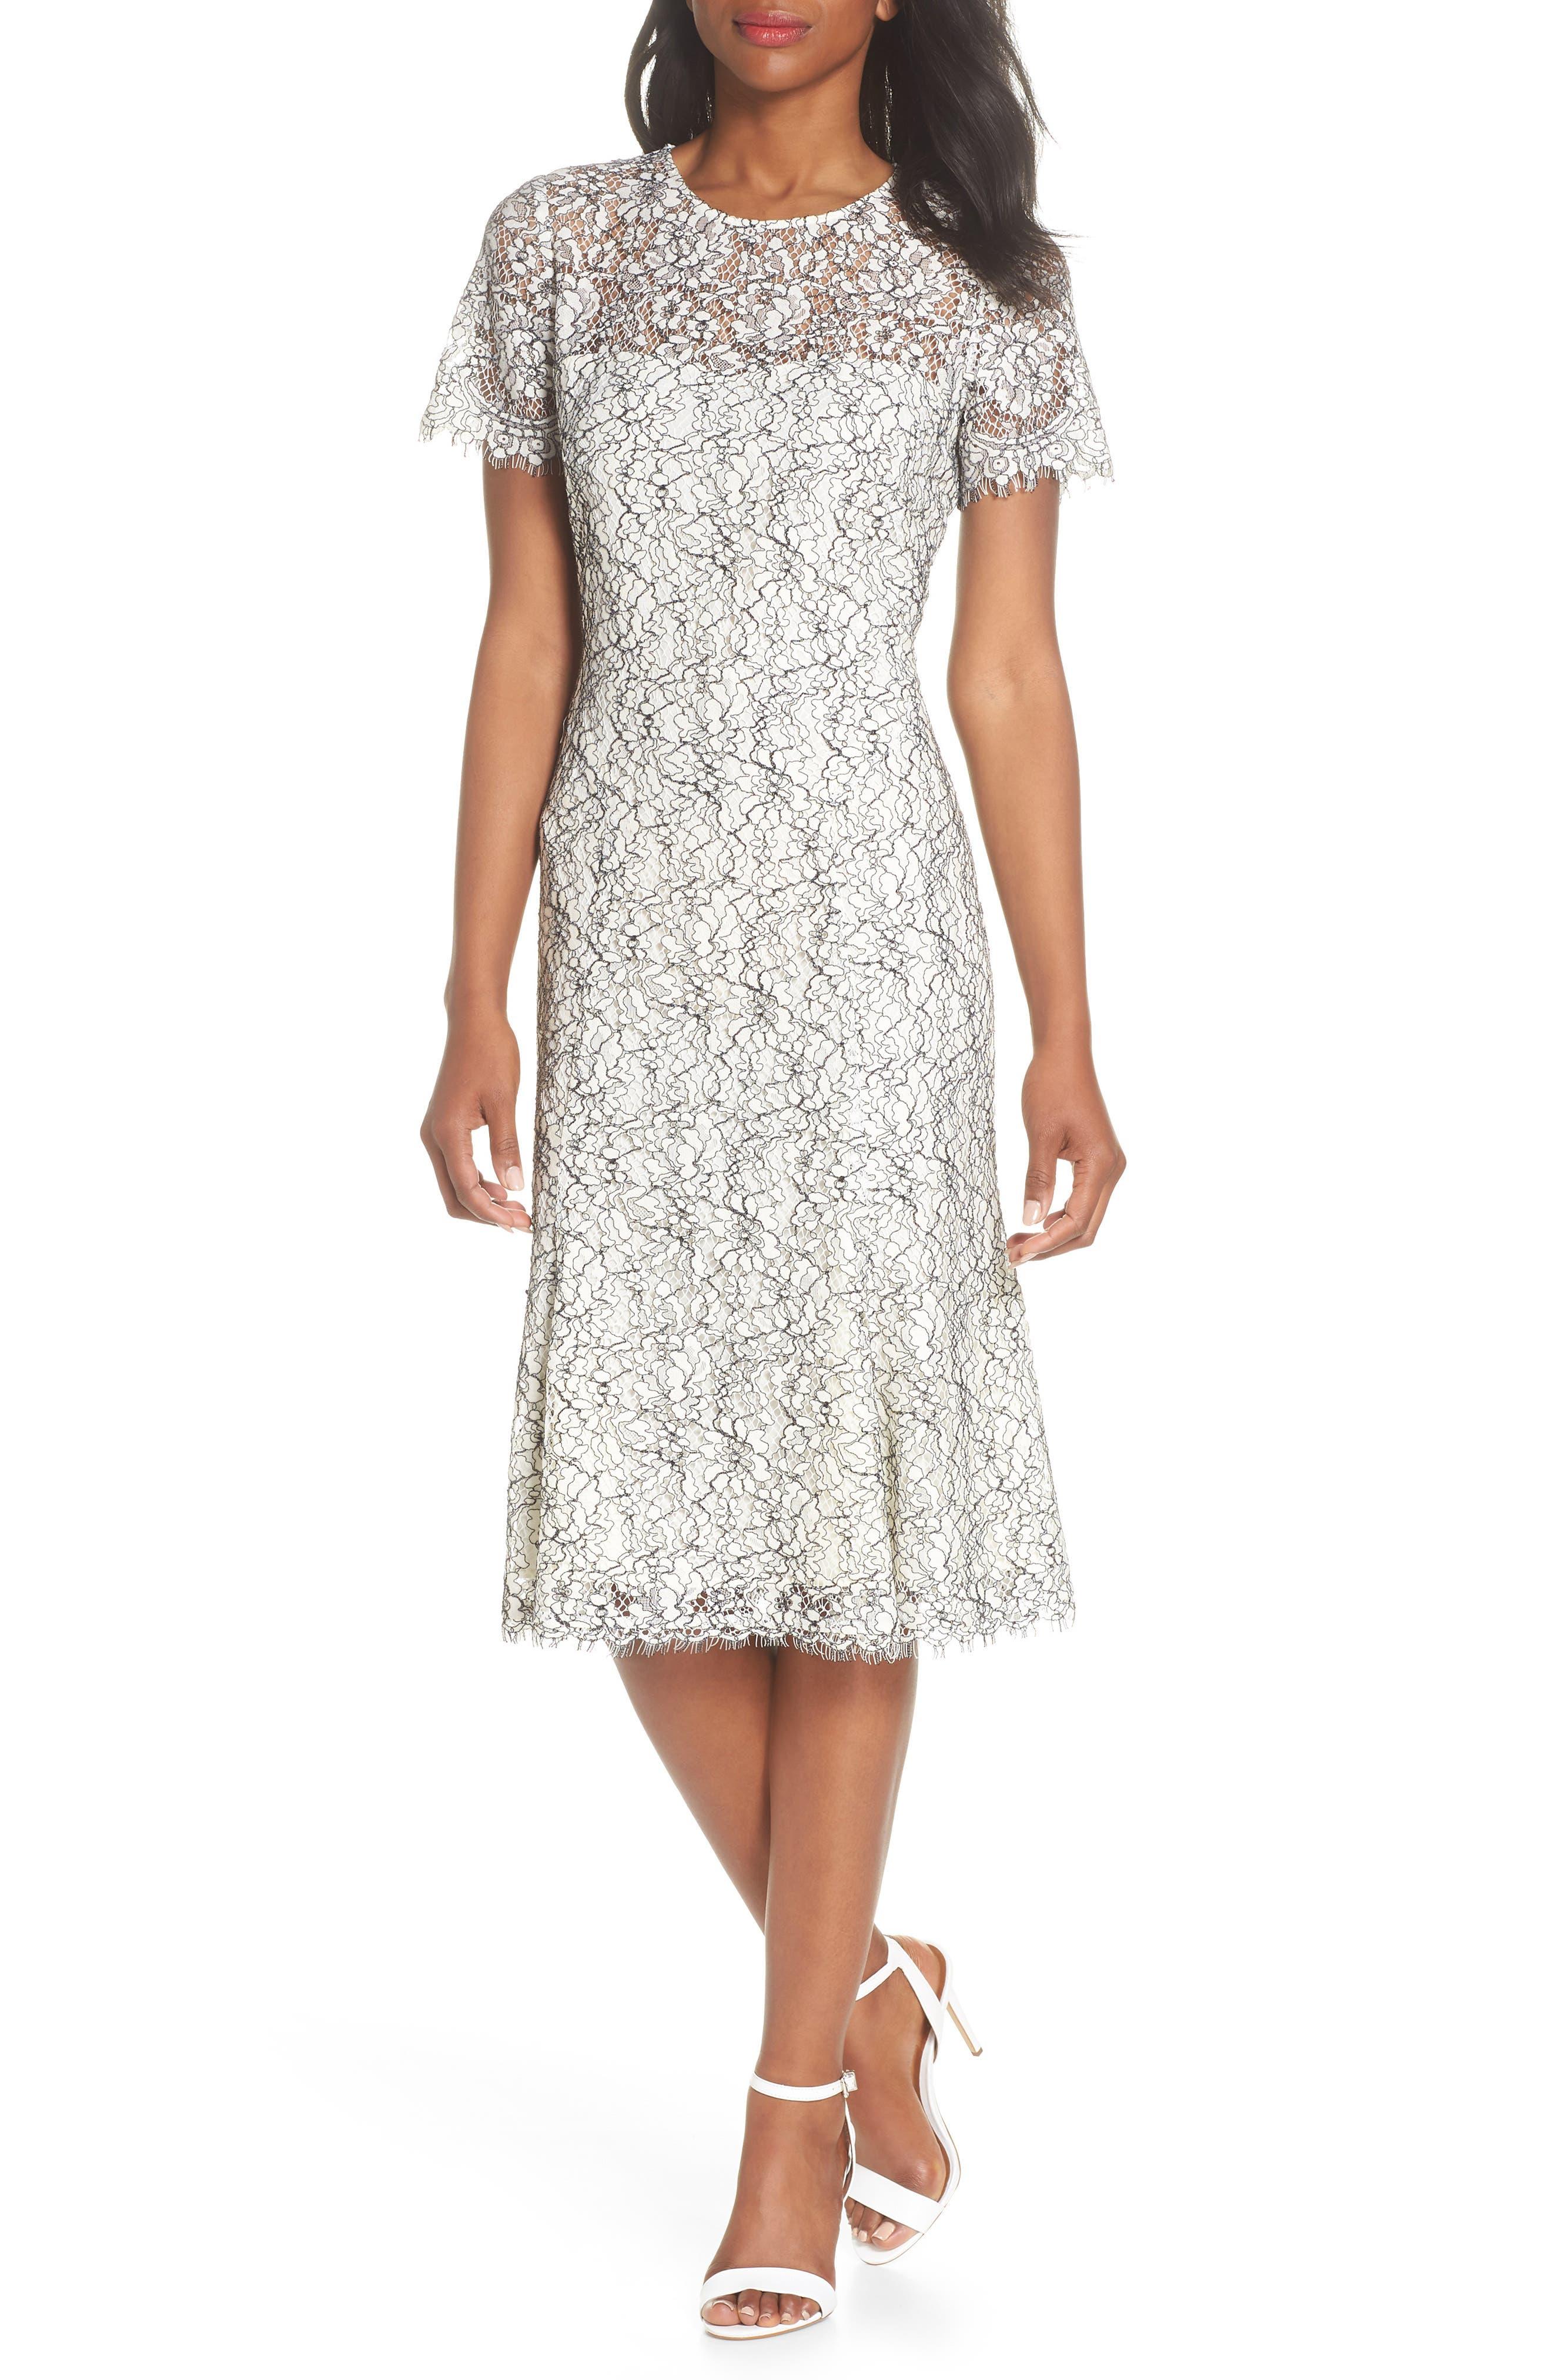 Two-Tone Lace A-Line Dress,                             Main thumbnail 1, color,                             Ivory/ Black